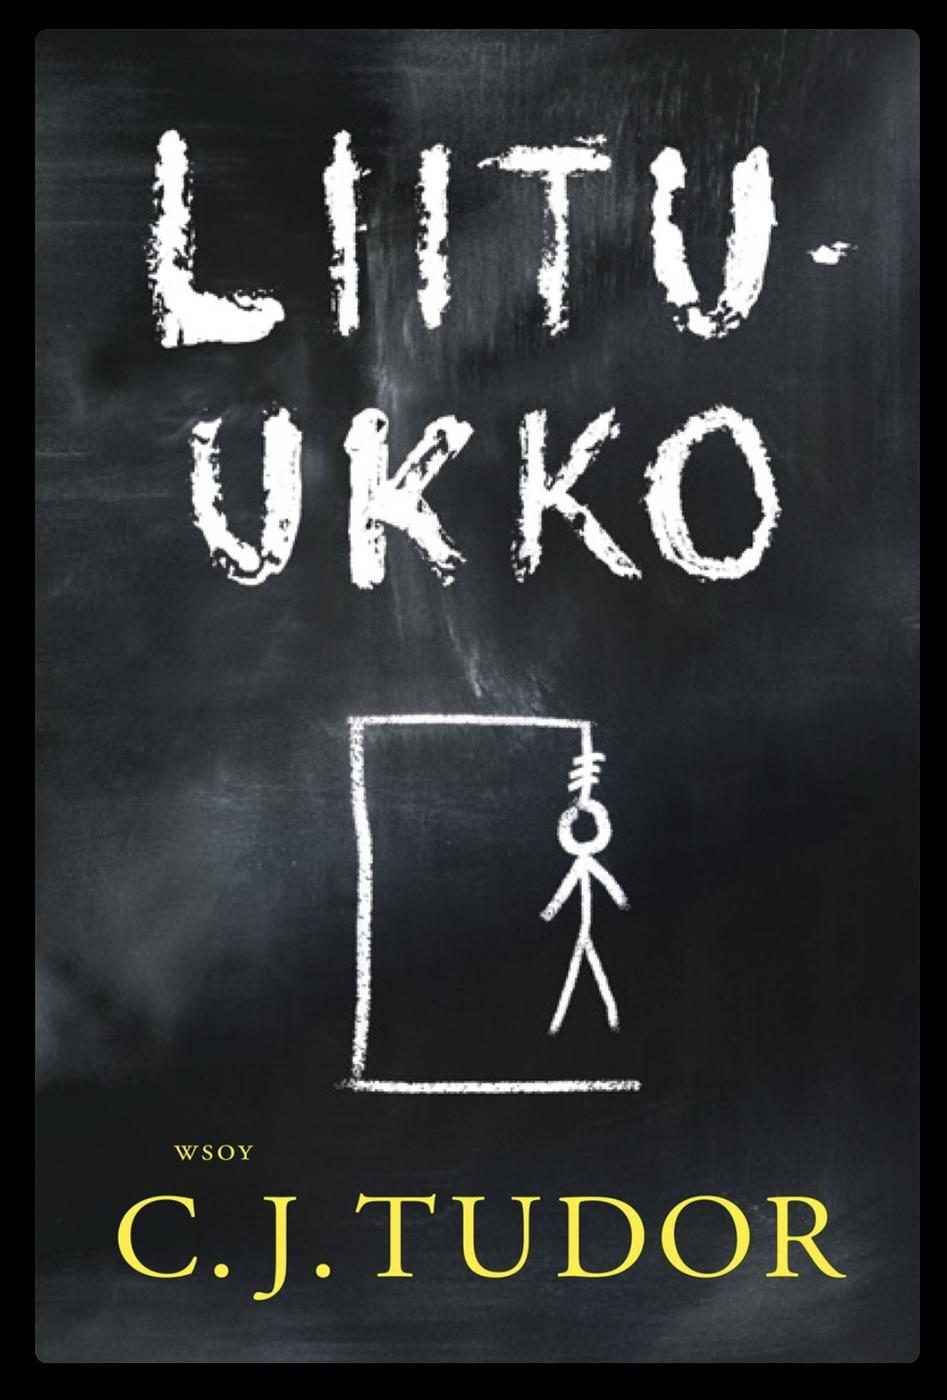 C.J.Tudor: Liitu-ukko